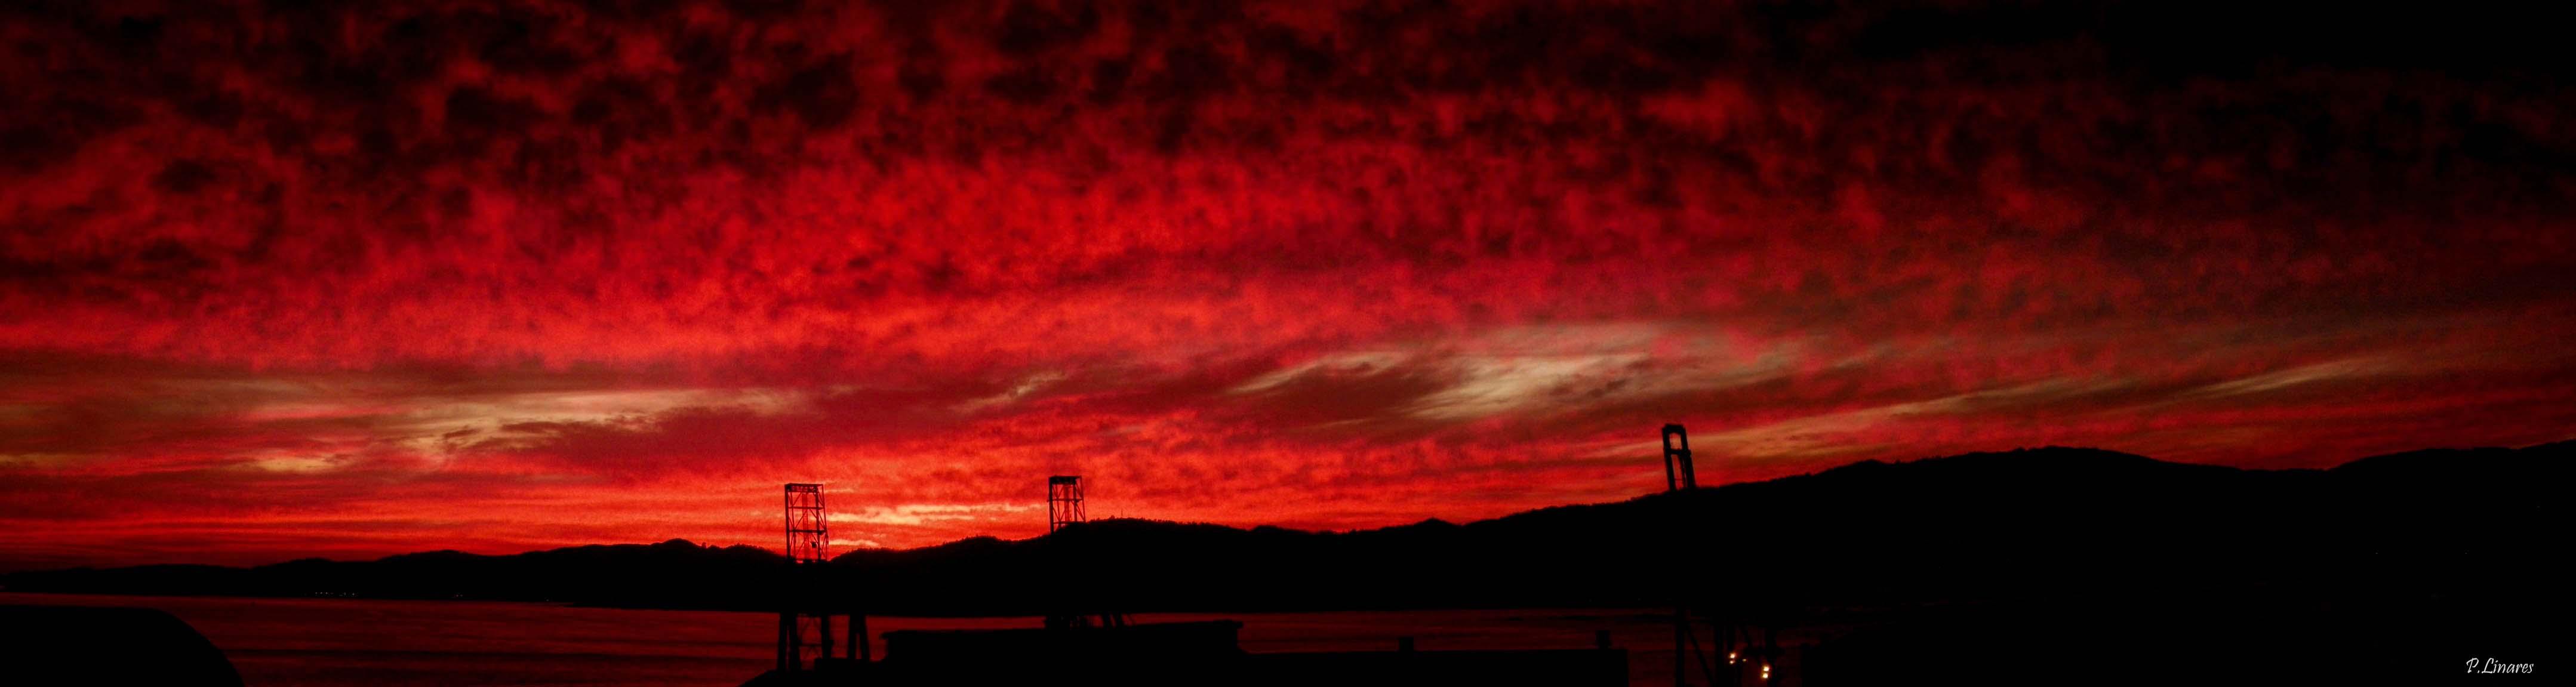 Wallpaper Sunset Red Sky Atardecer Fire Twilight